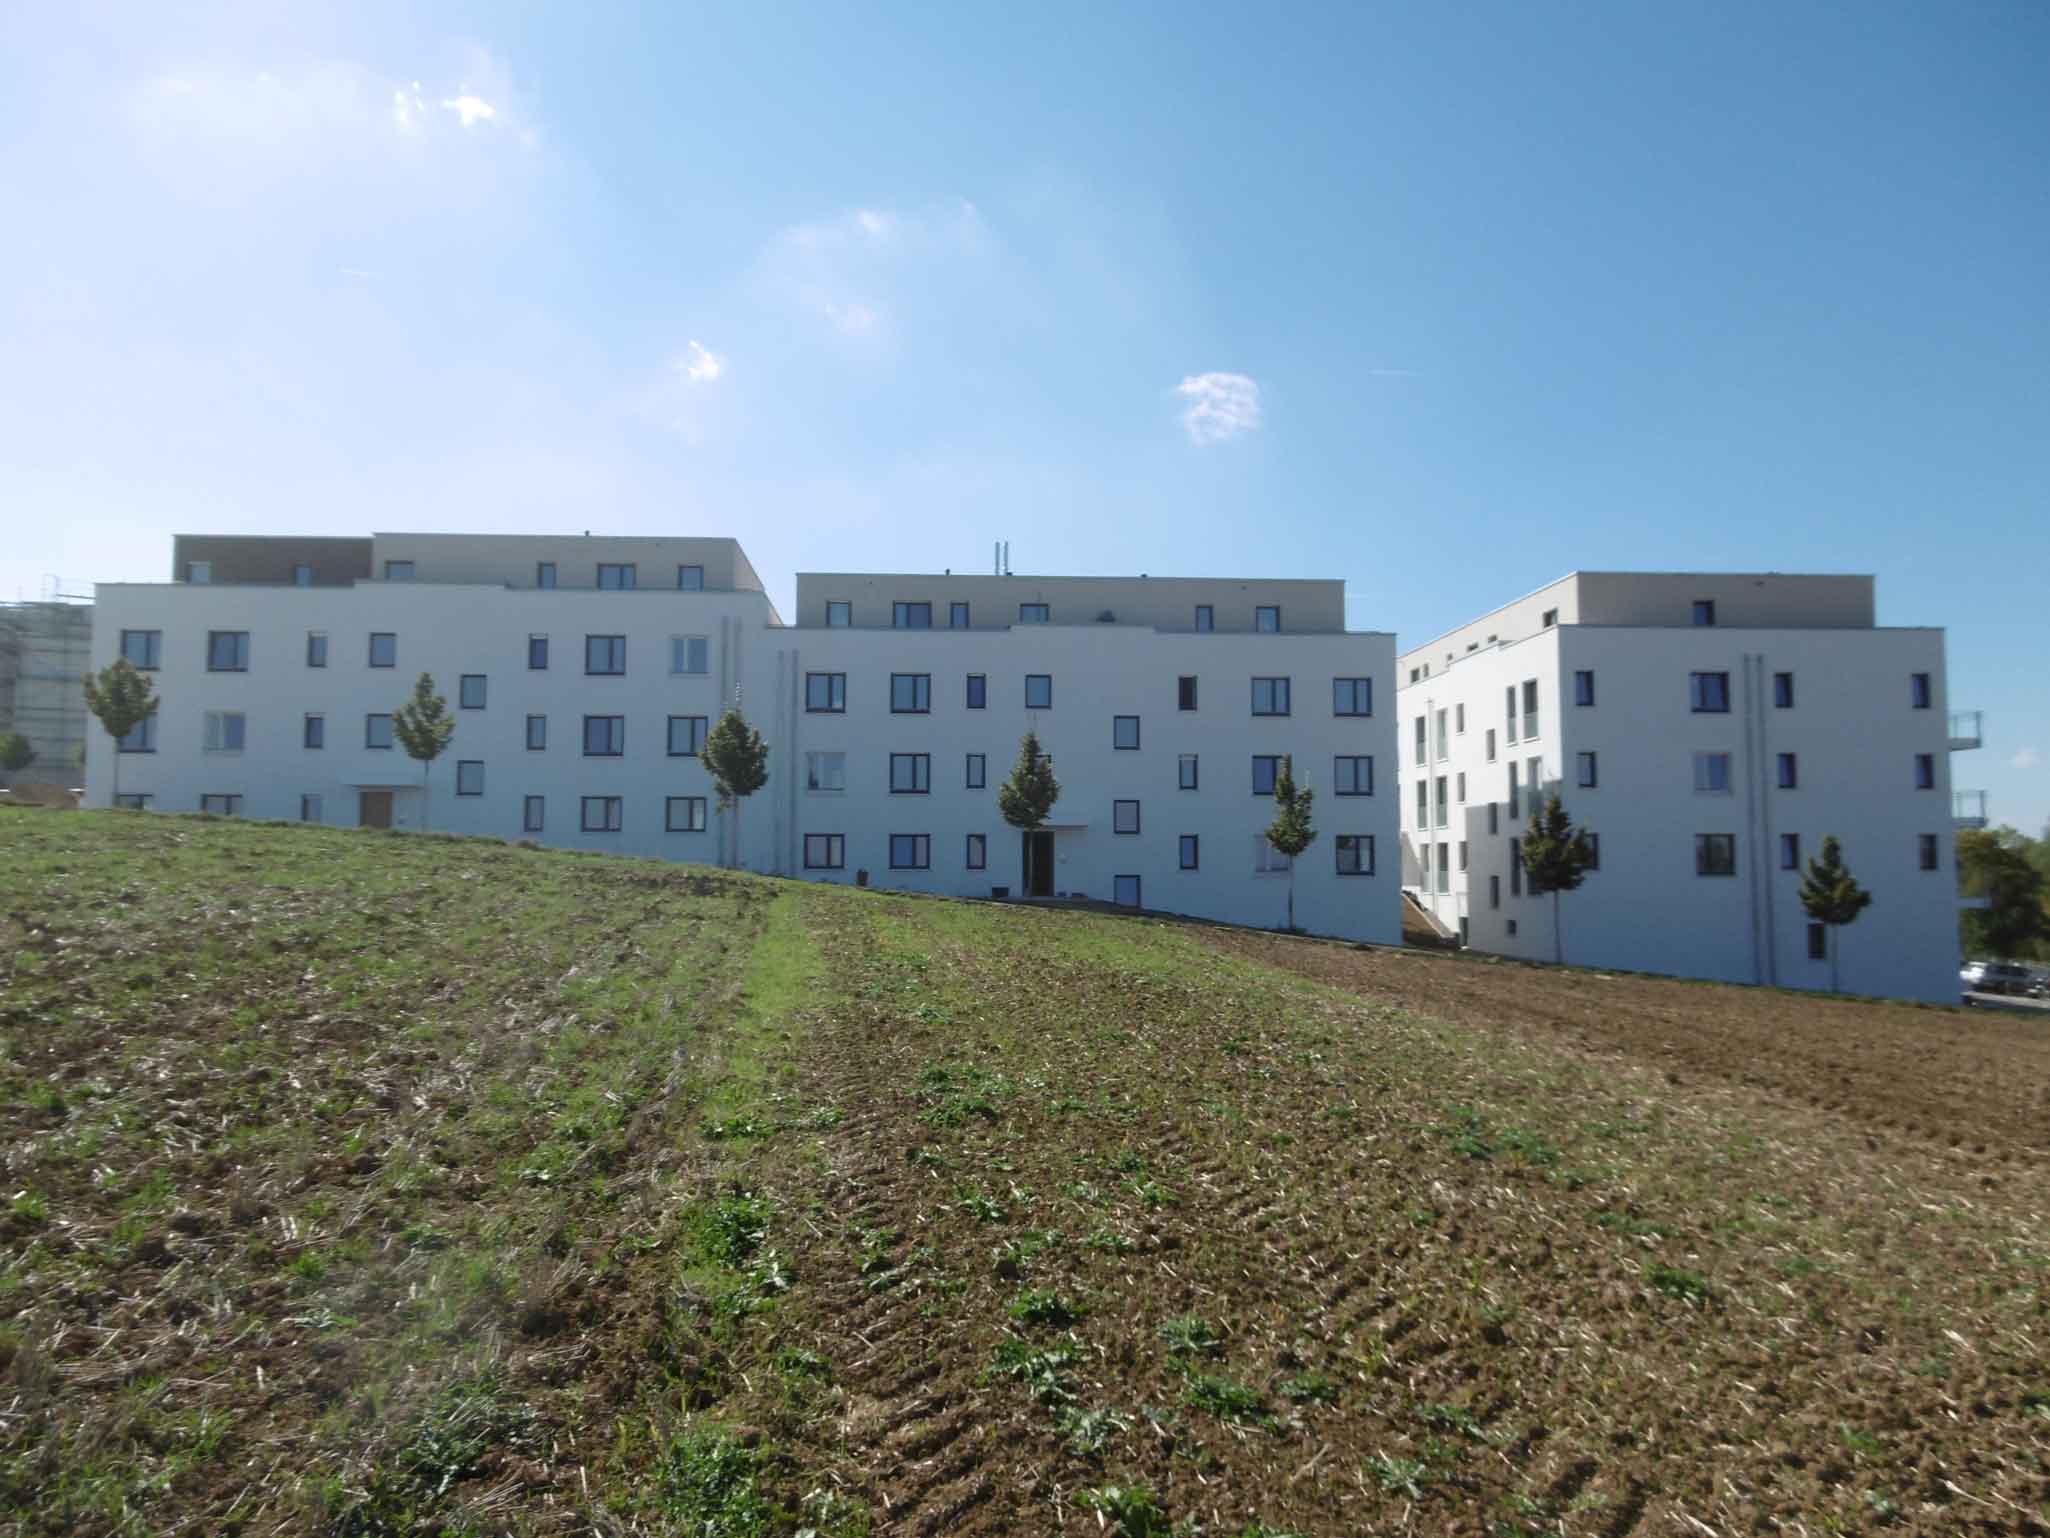 Würzburg Lengfelder Höh